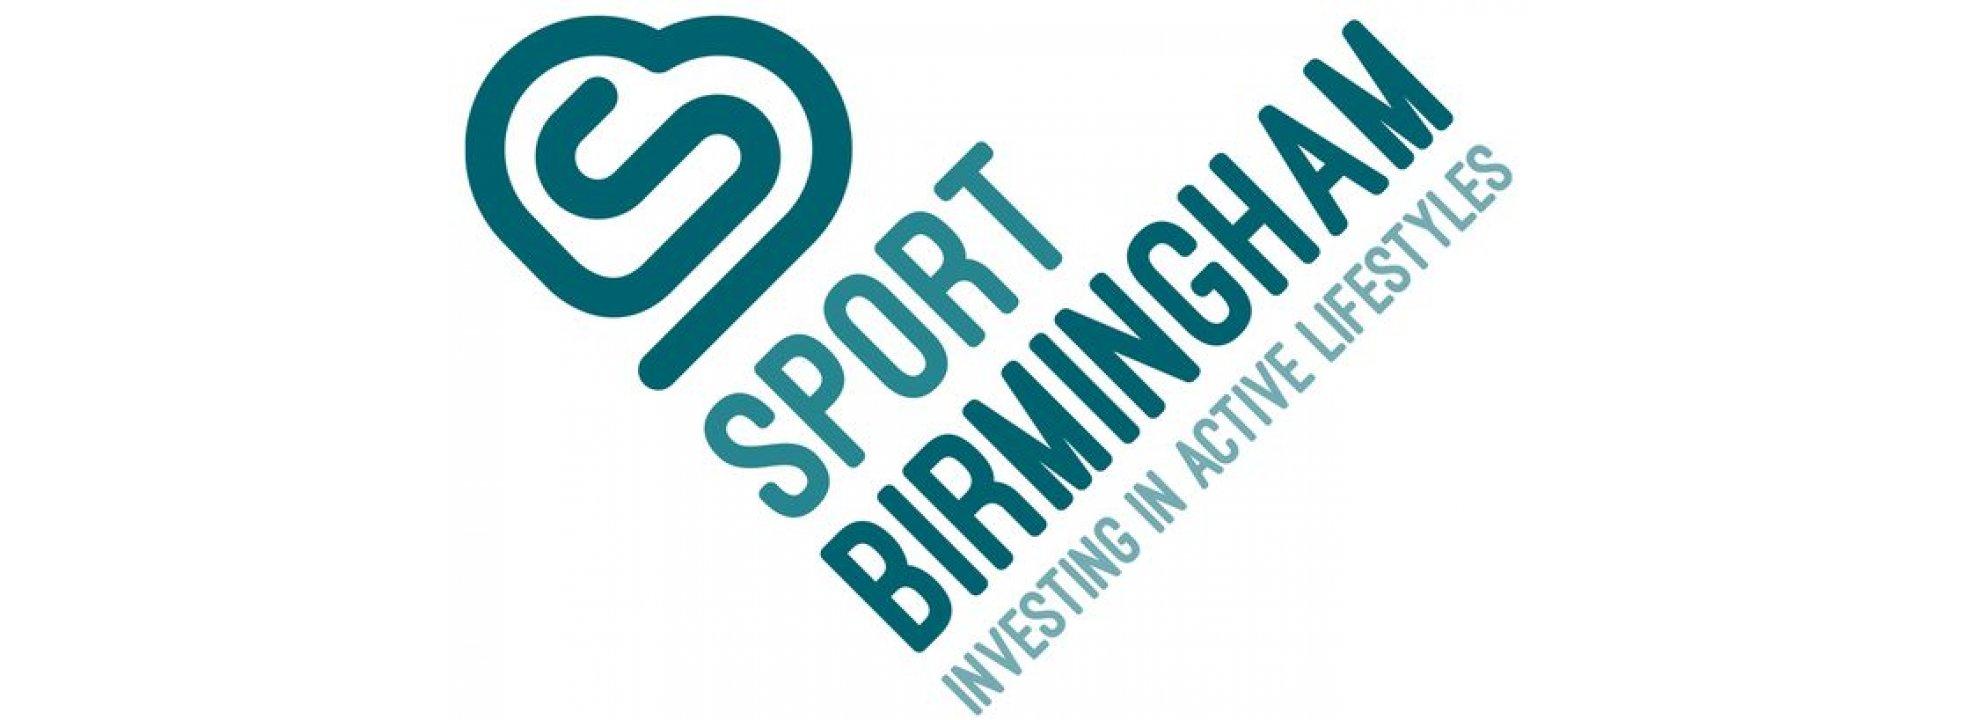 Birmingham School Games - Event Management Banner